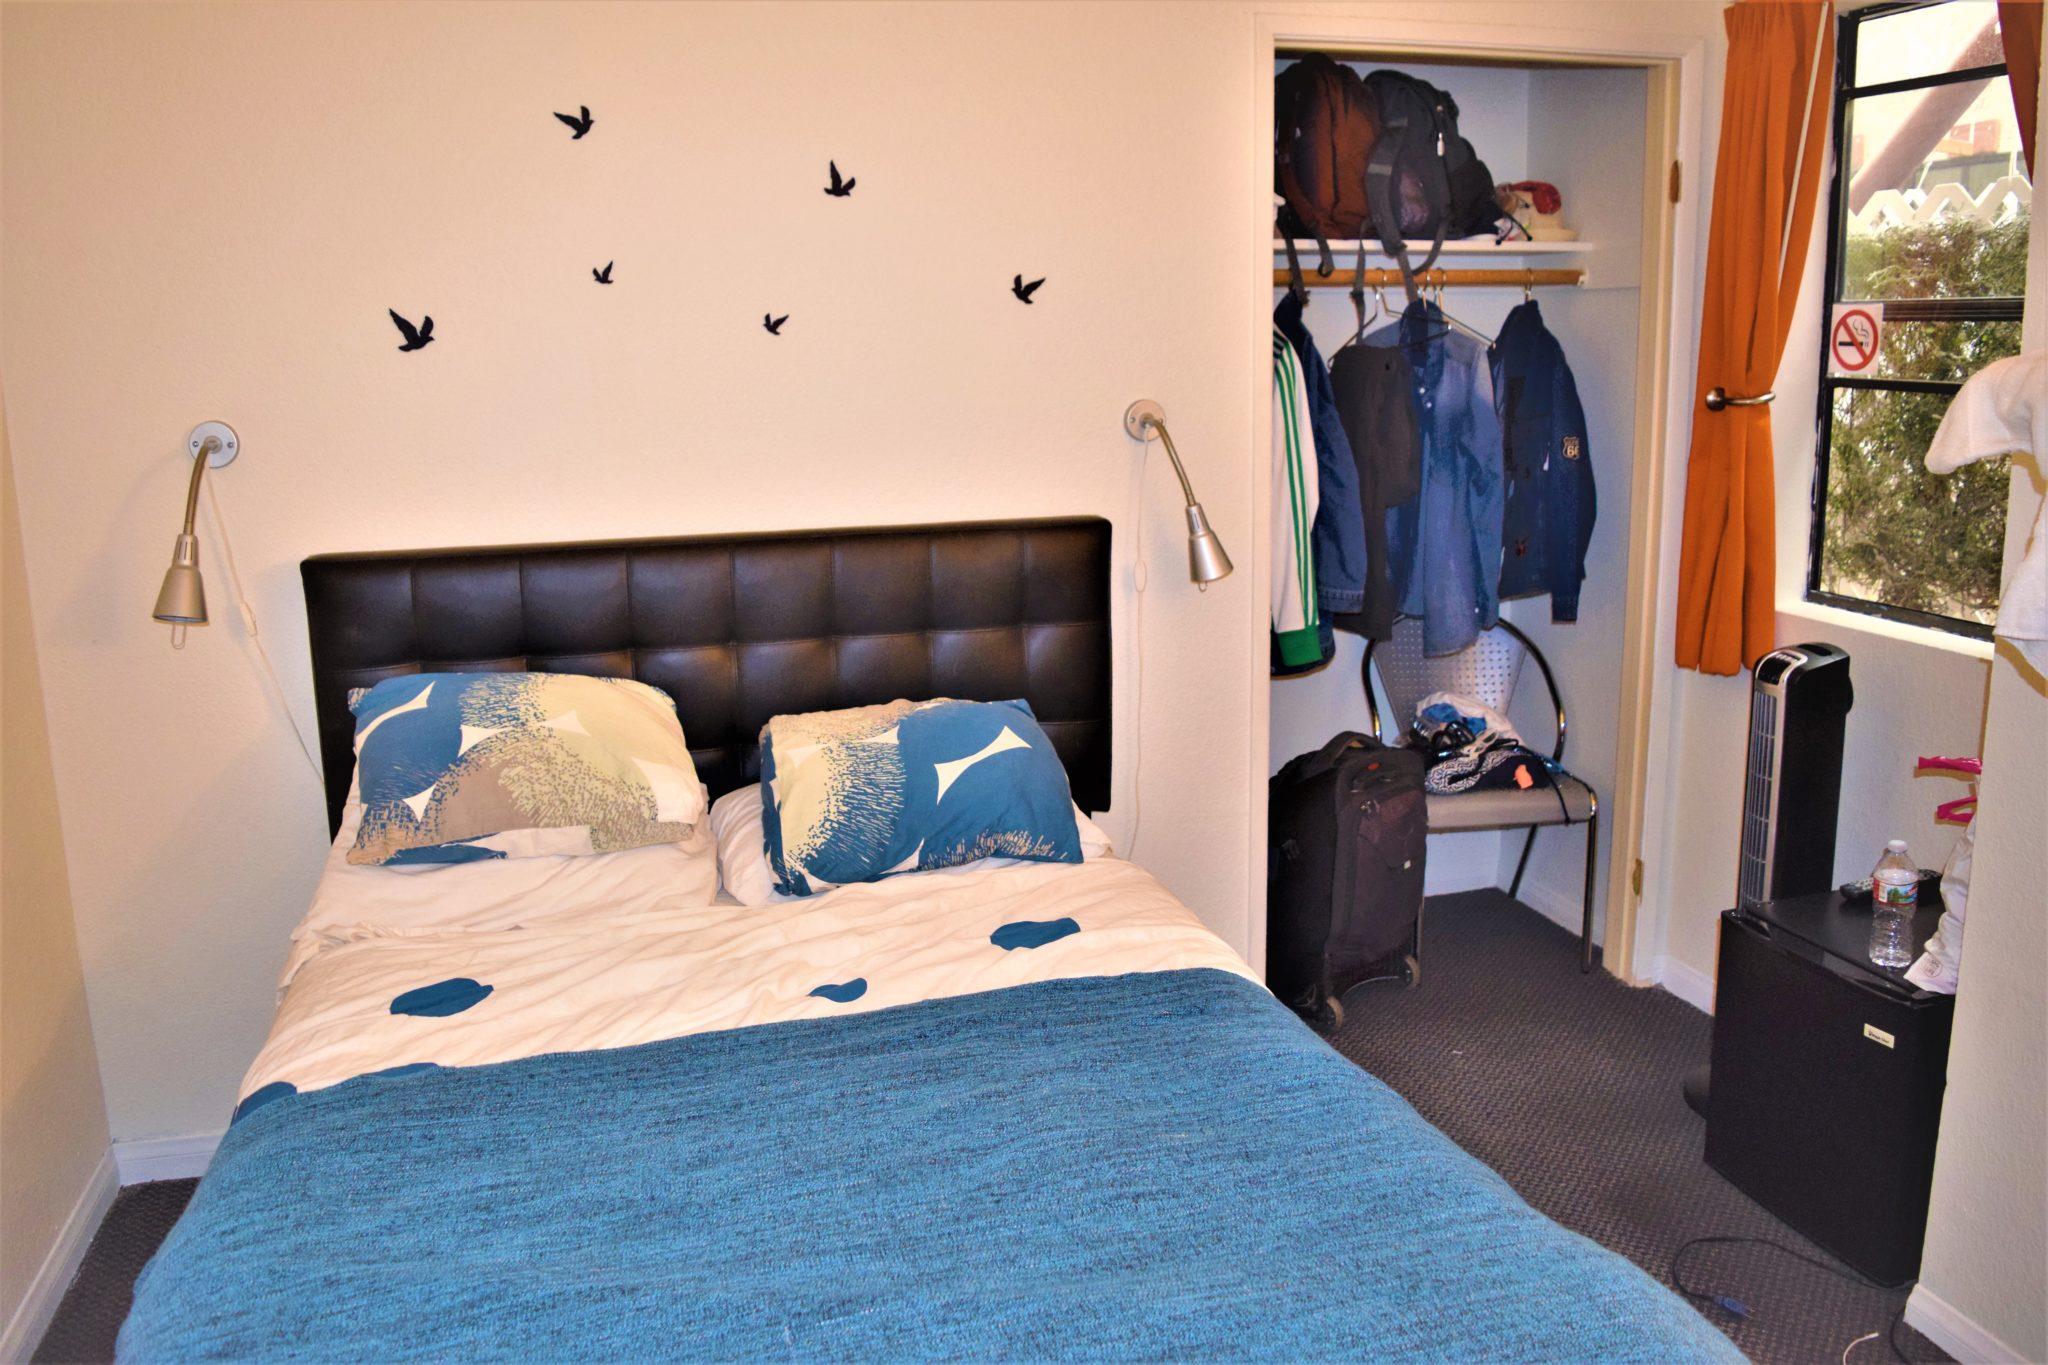 Private room, double bed, Samesun Venice Beach Hostel, Los Angeles, California